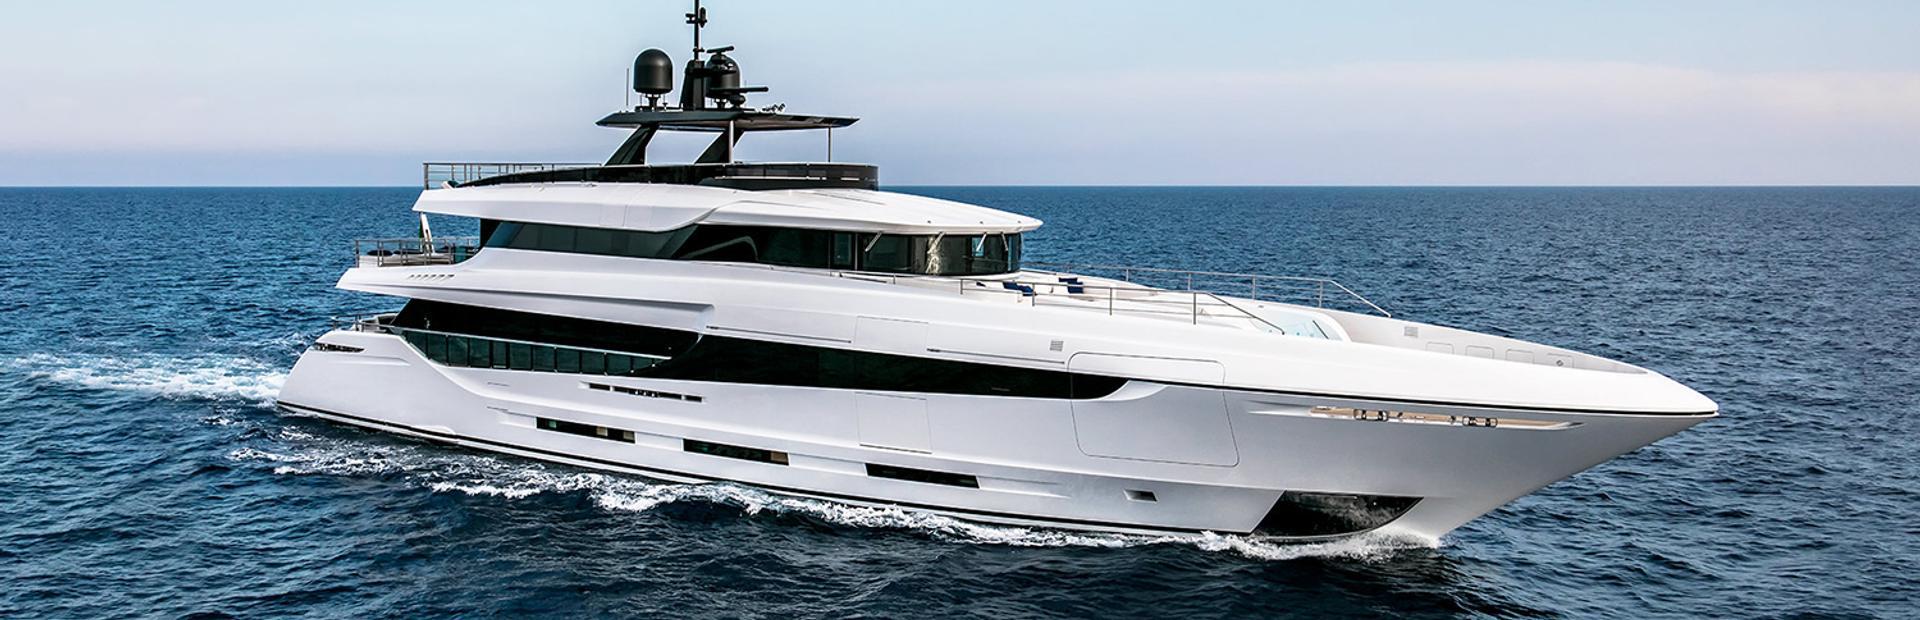 Mangusta Oceano 43 Yacht Charter